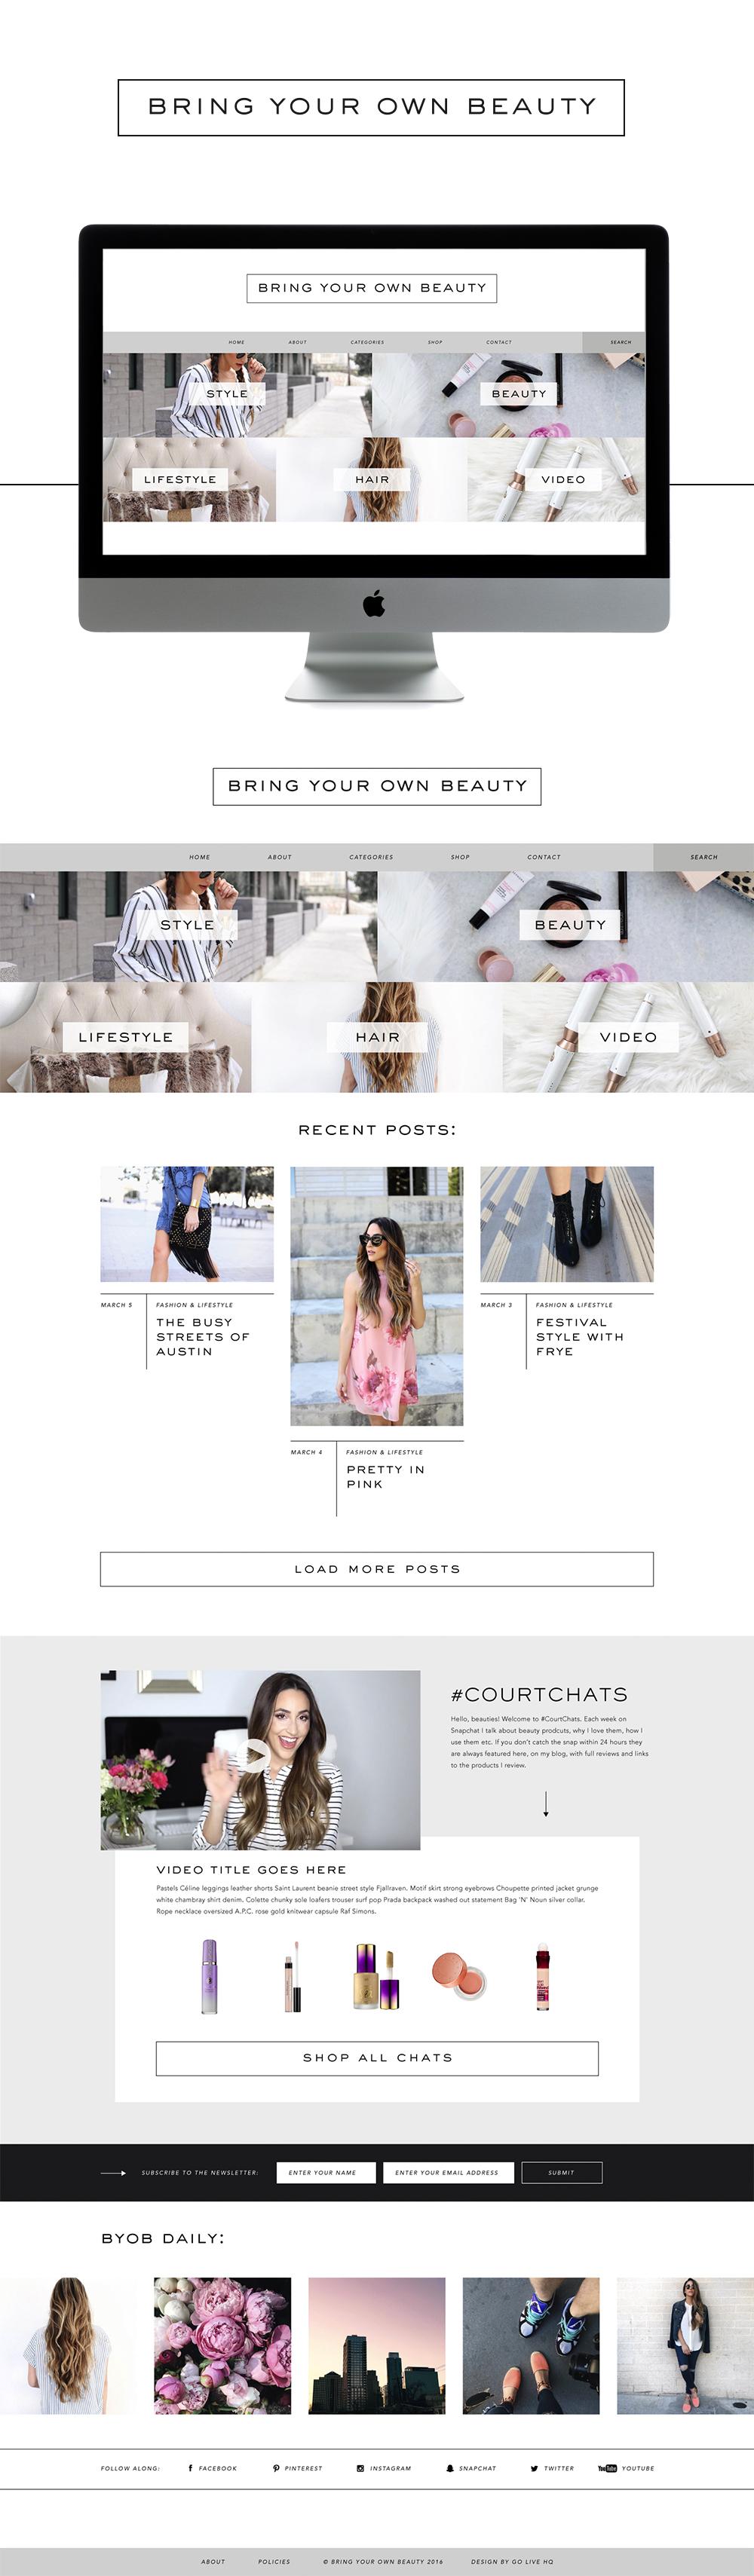 chic editorial wordpress website design | designed by: golivehq.co